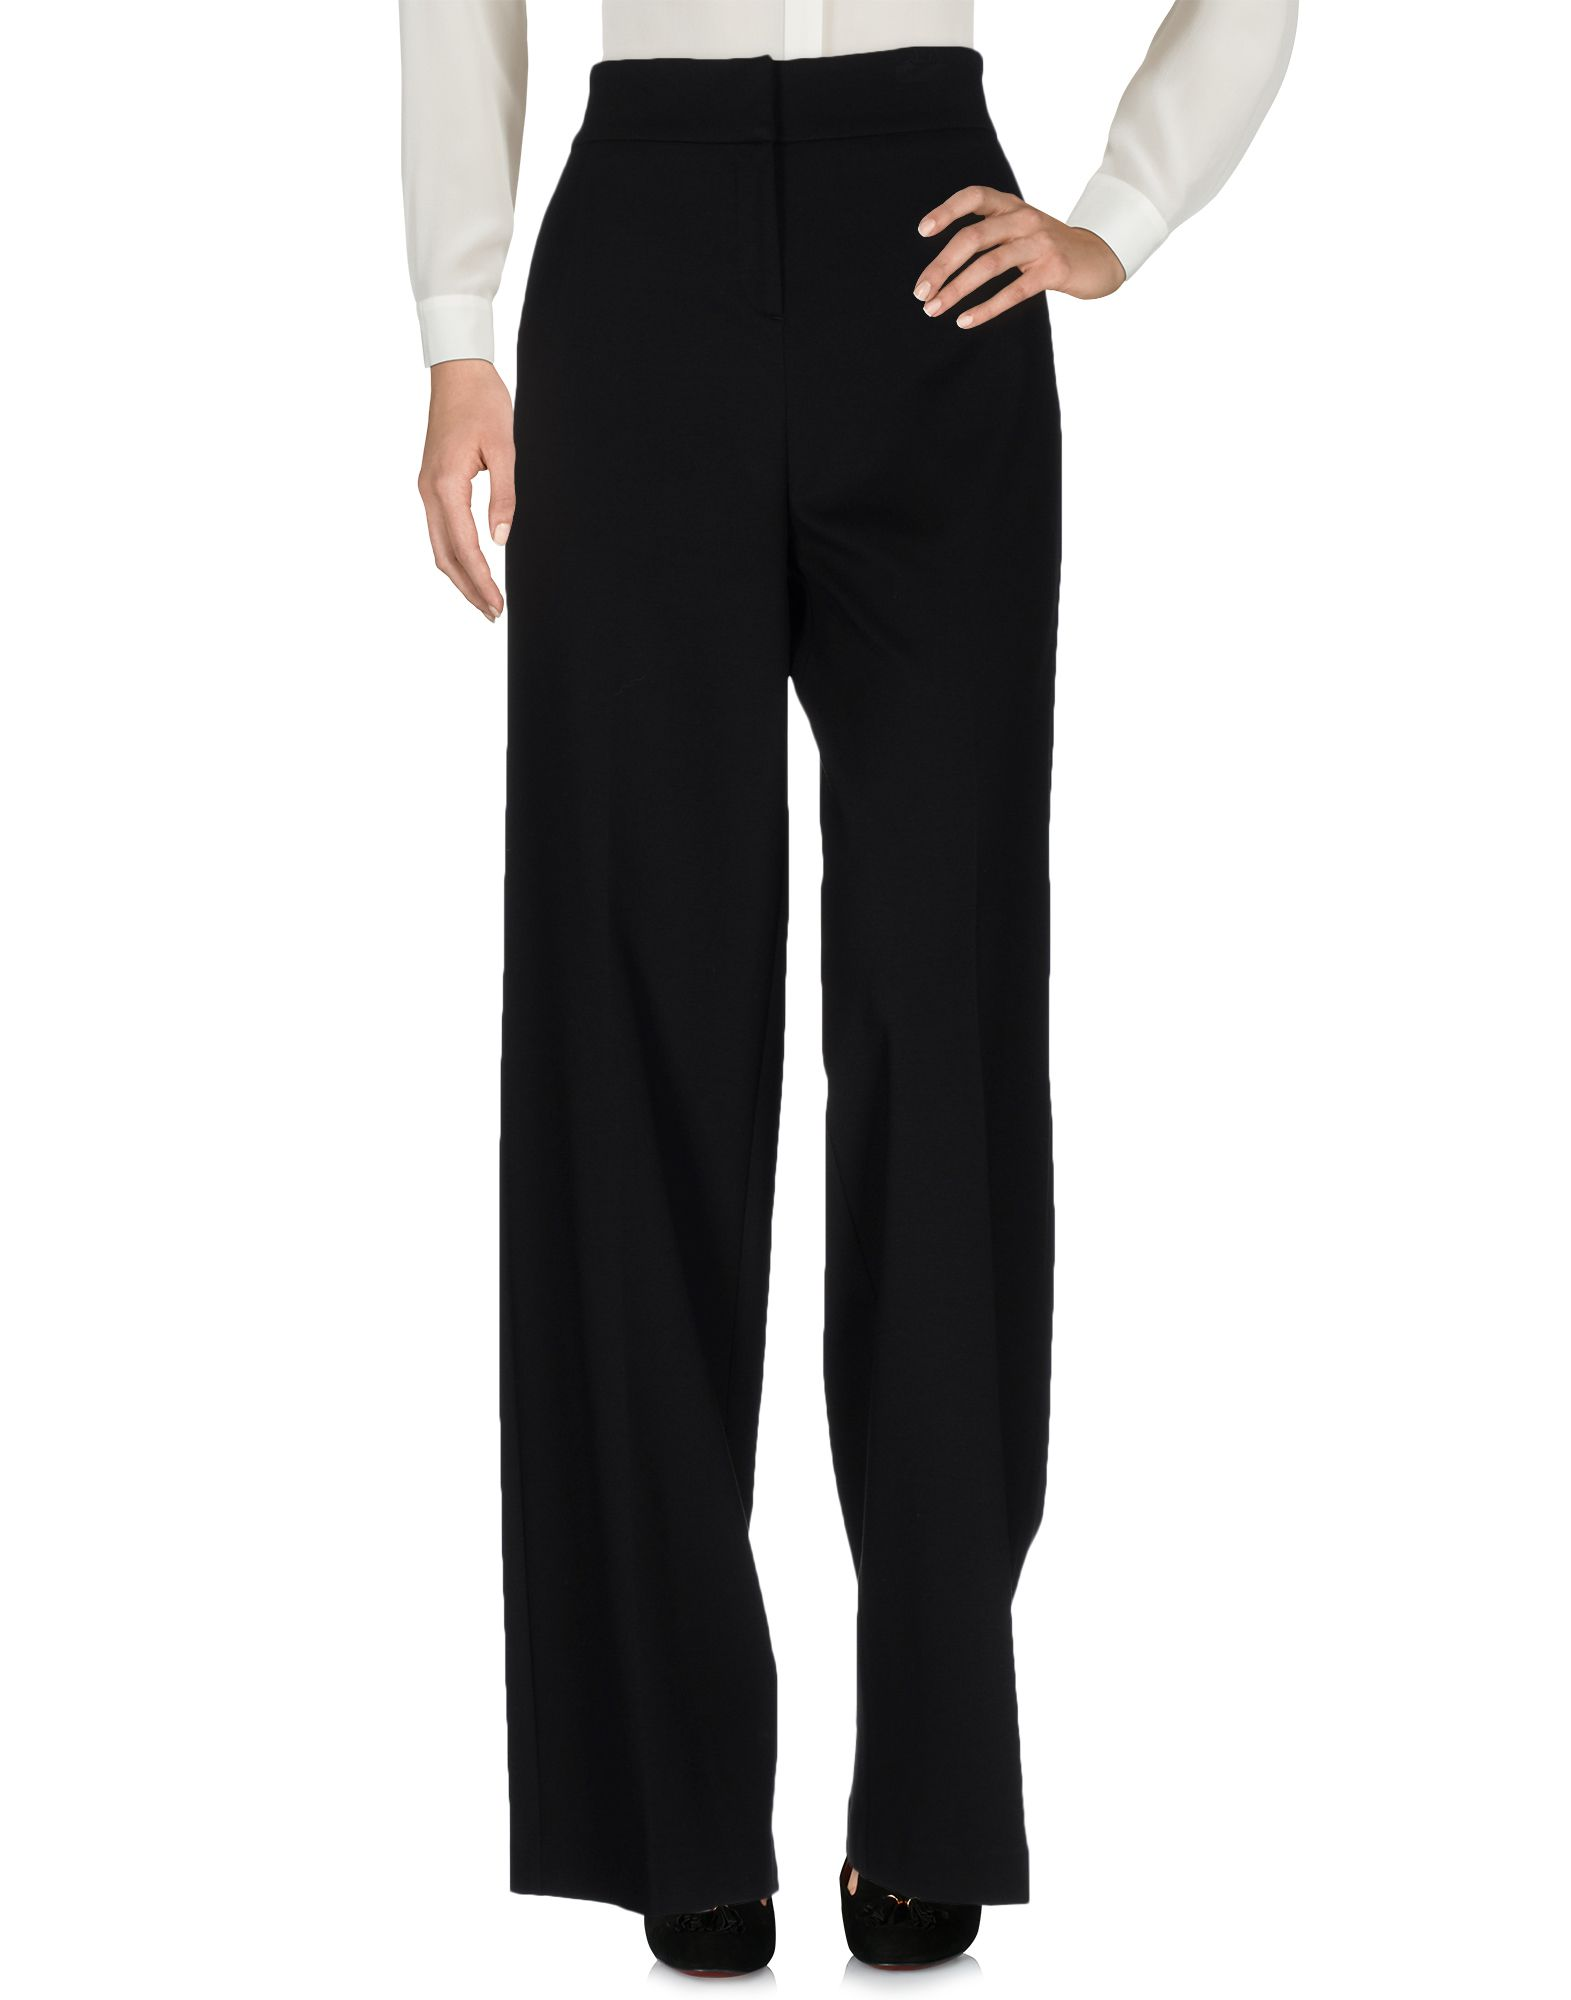 цена MÊME by GIAB'S Повседневные брюки онлайн в 2017 году